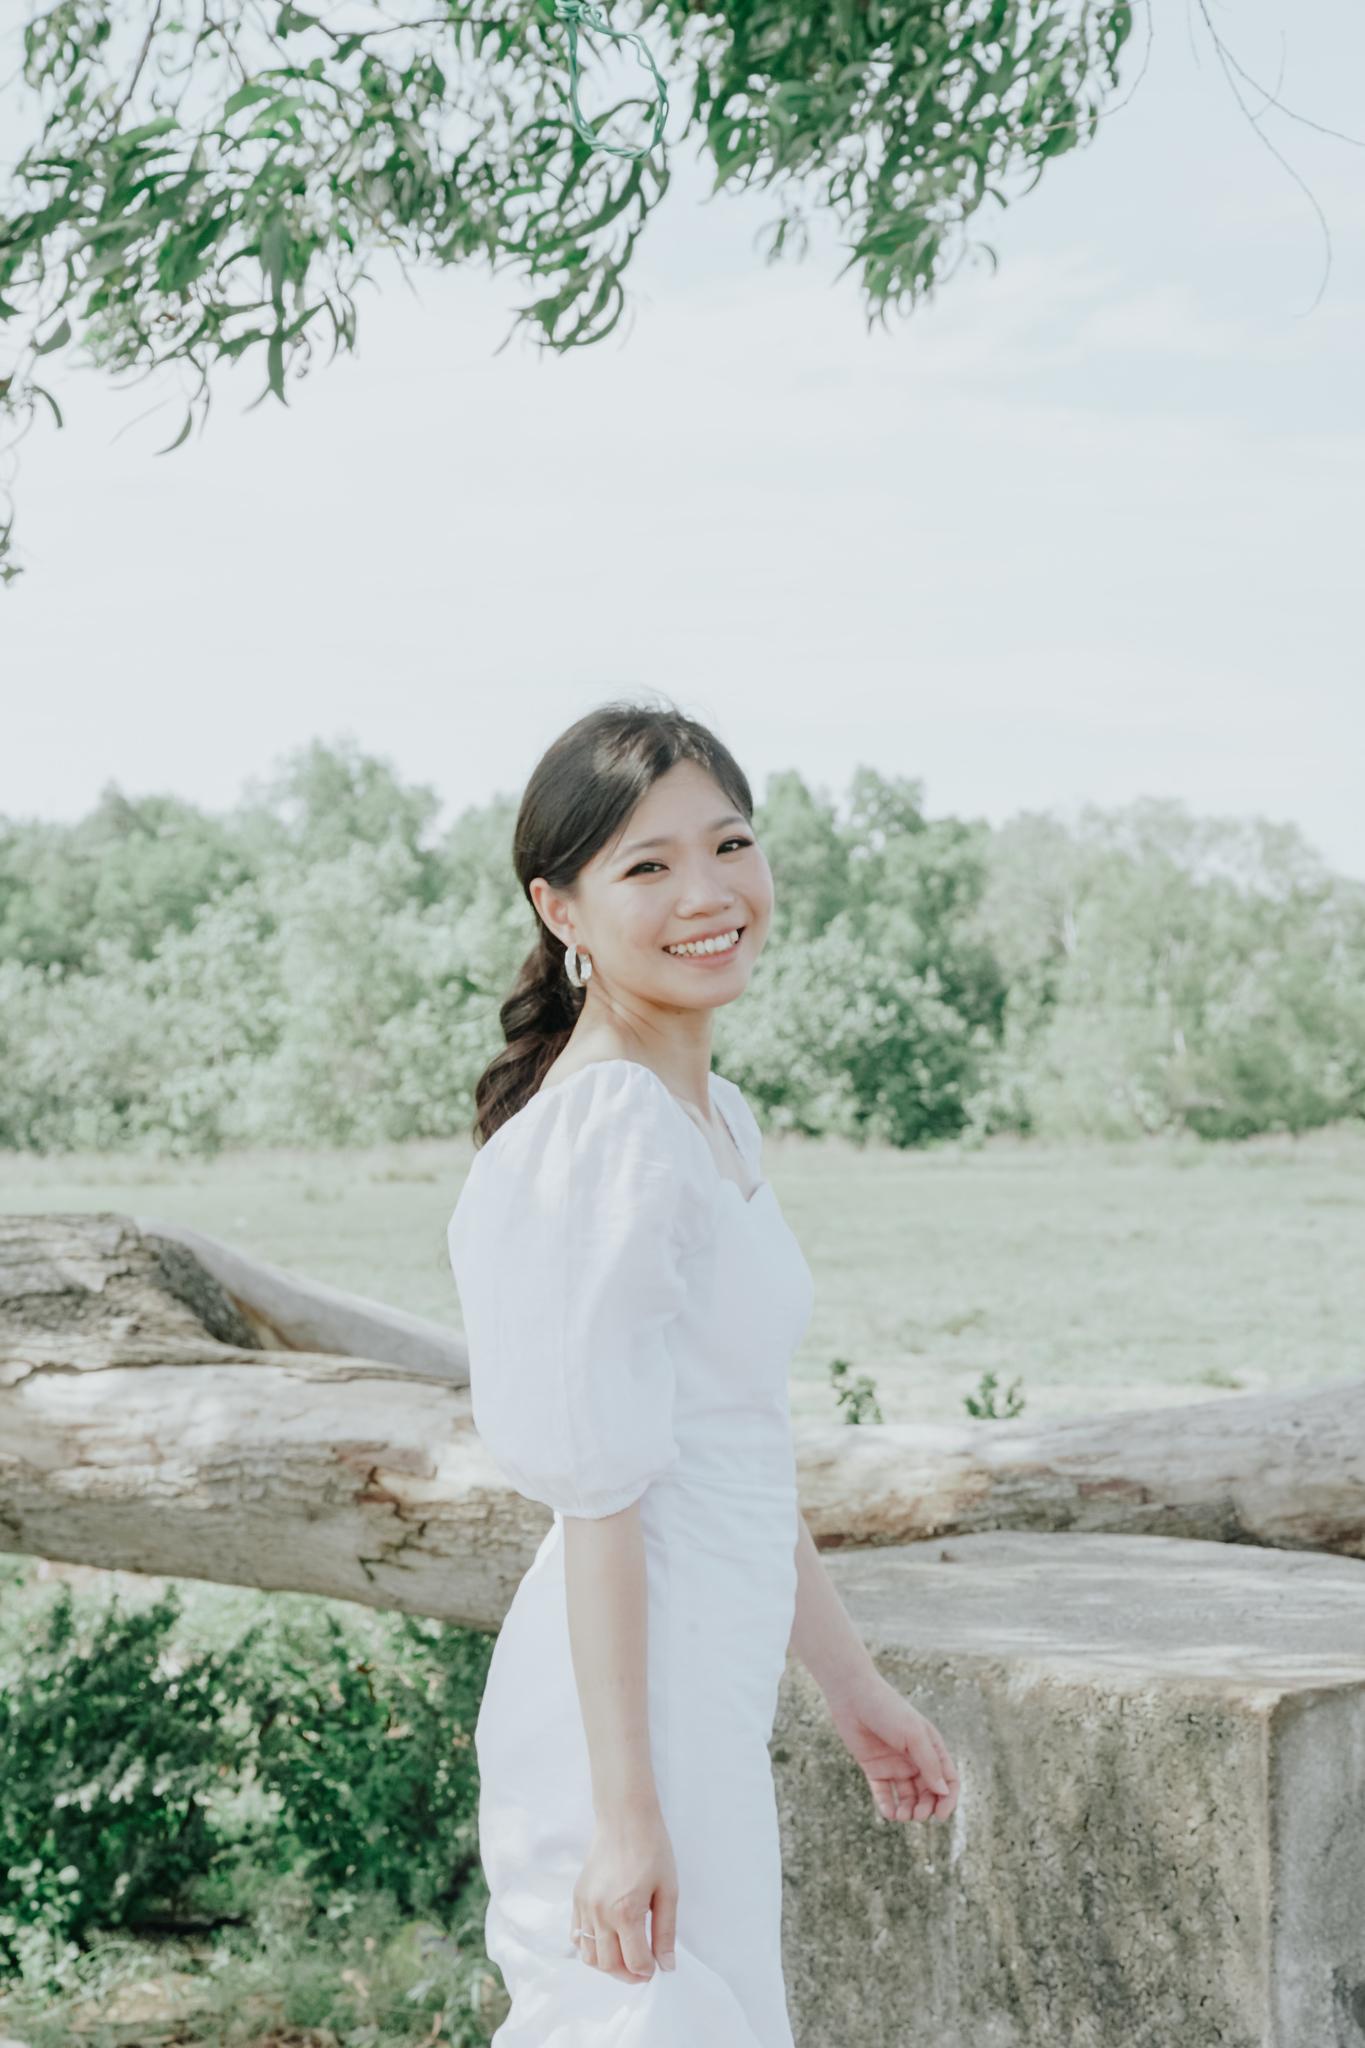 Pre Wedding Lifestlye Portrait Shoot in Pantai Acheh Klang